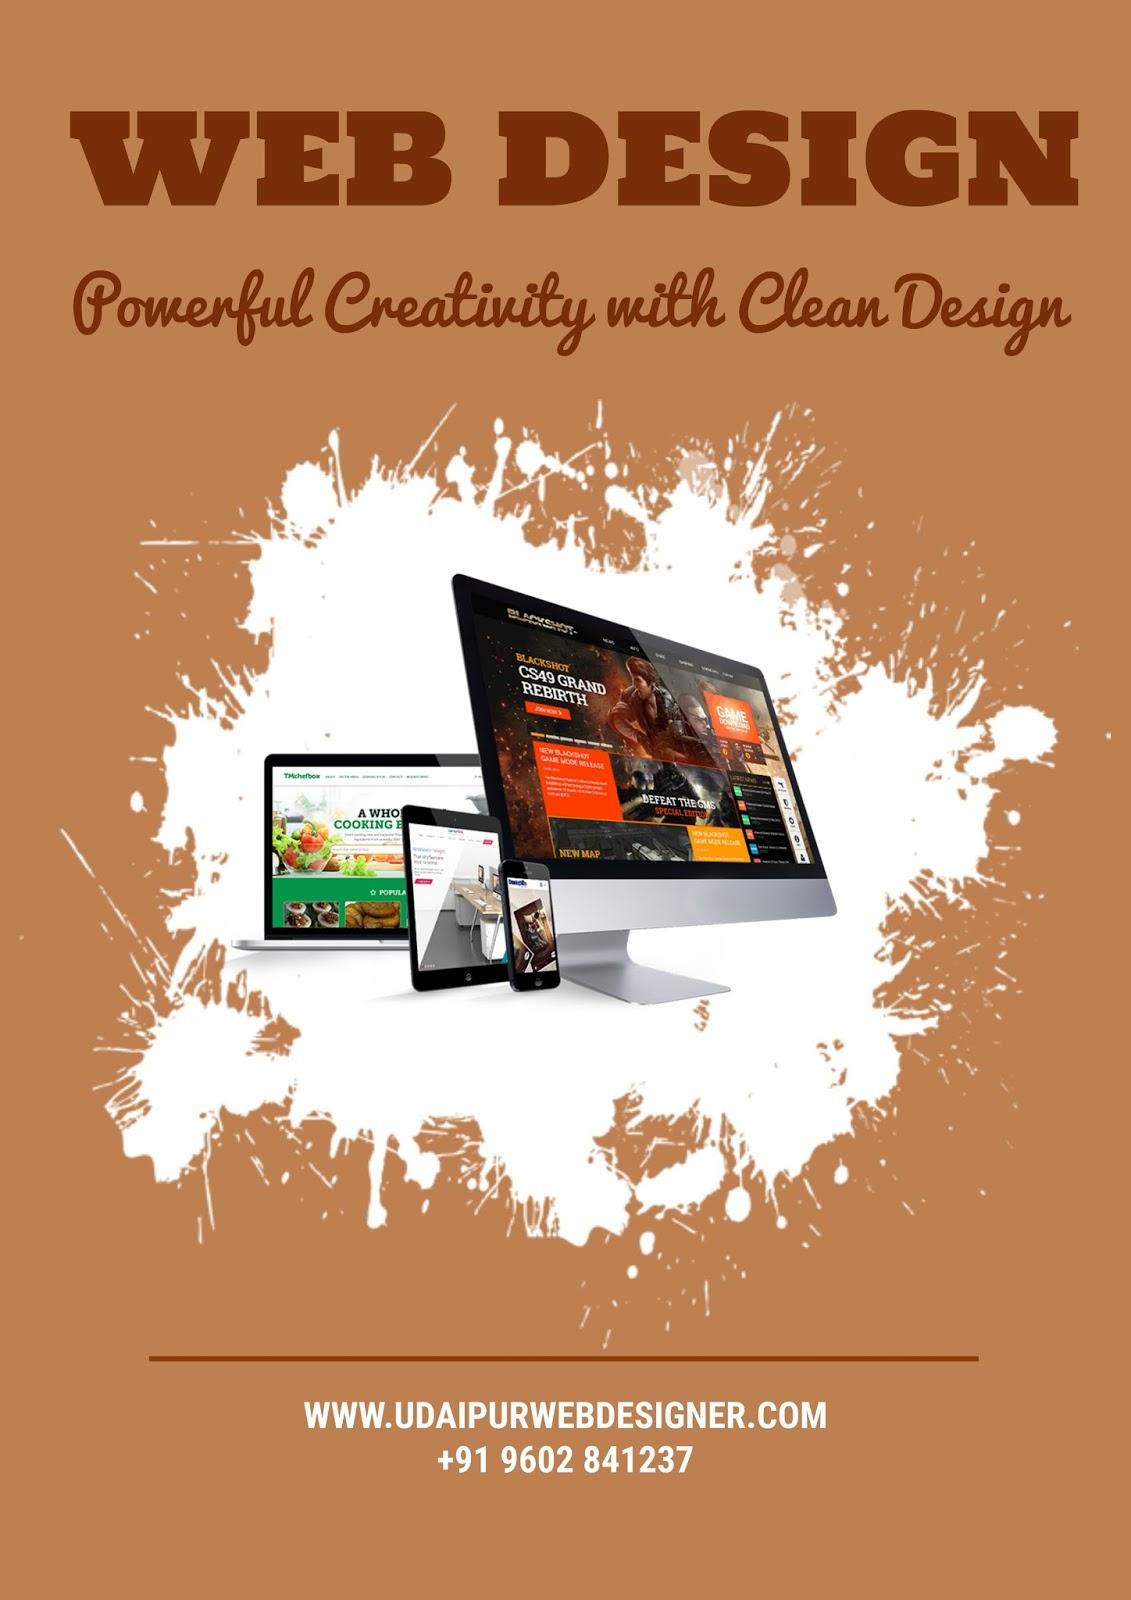 web banner design ideas - Banner Design Ideas